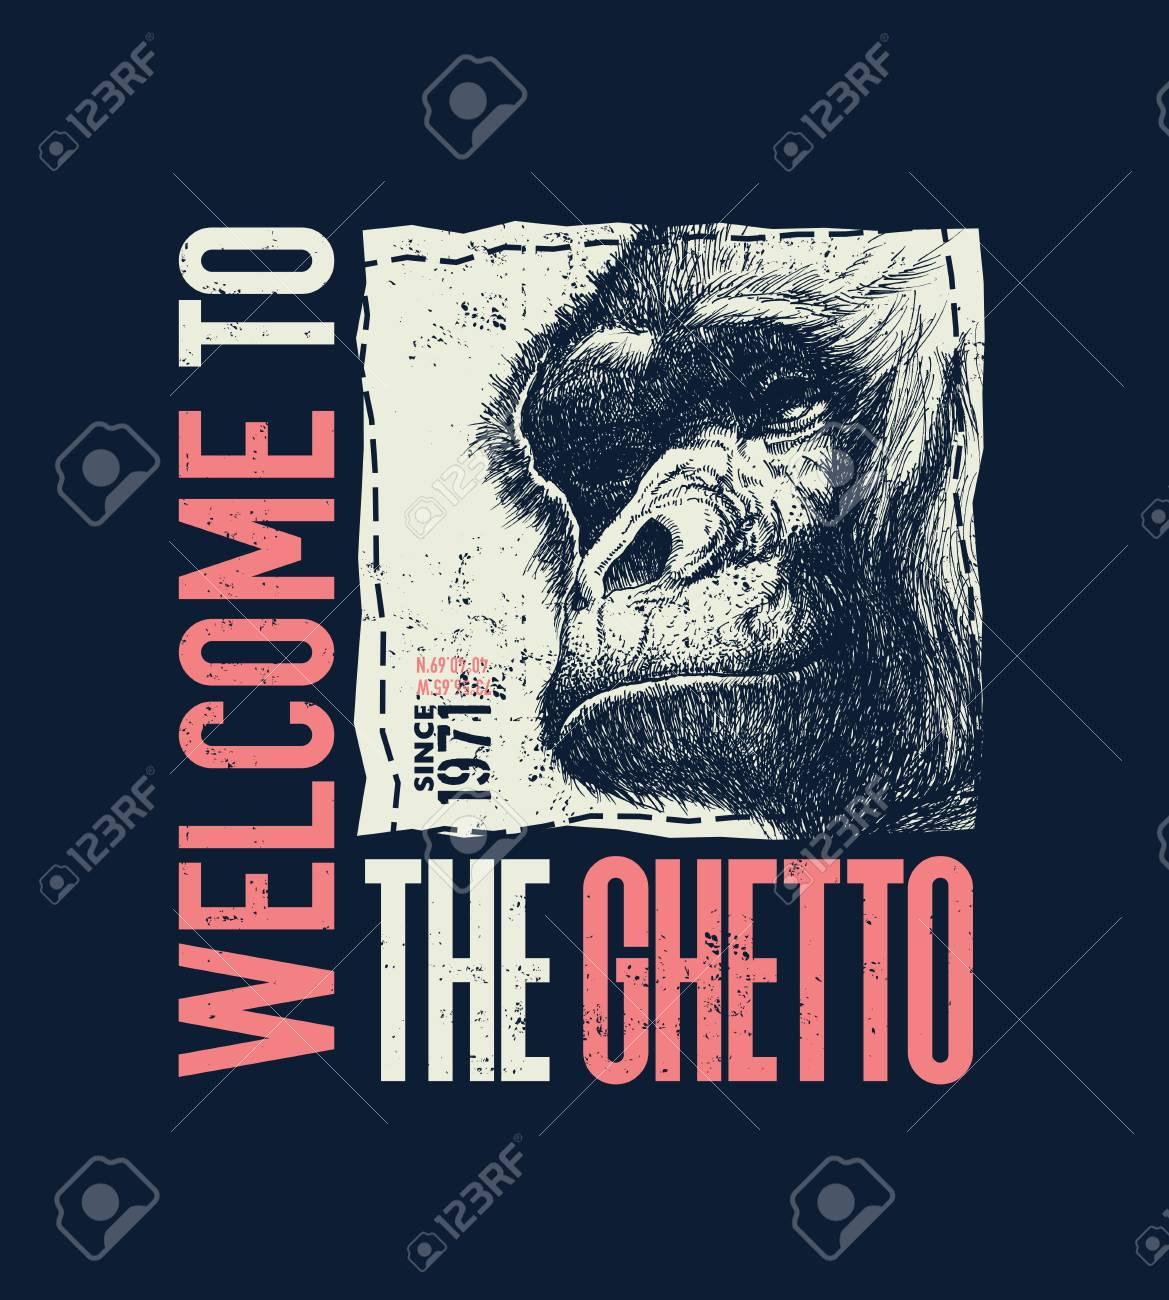 gorilla clipart.html